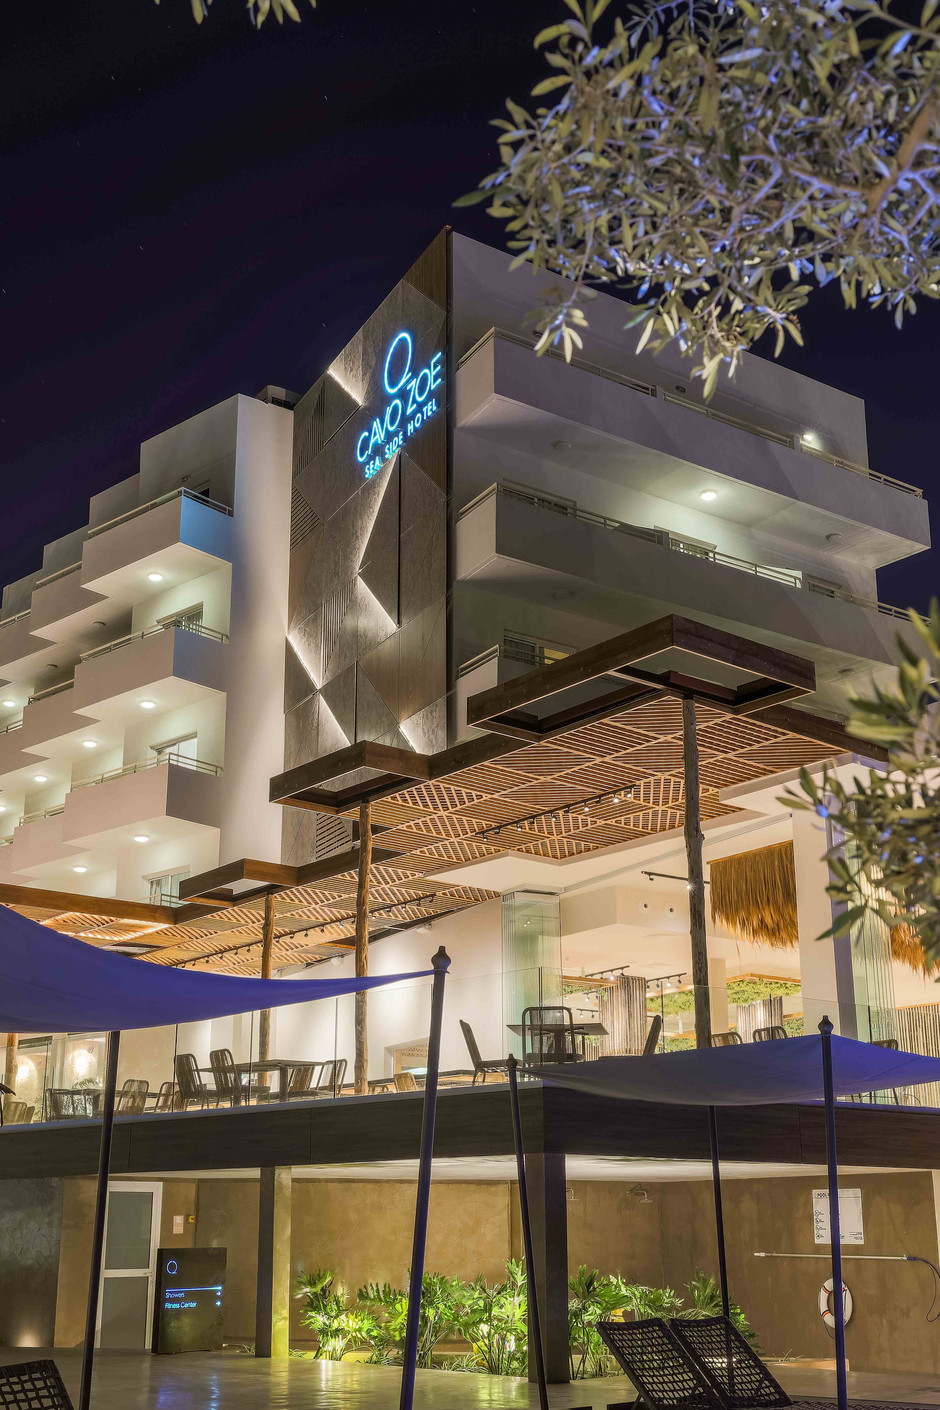 Cavo Zoe Seaside Hotel-22.jpg